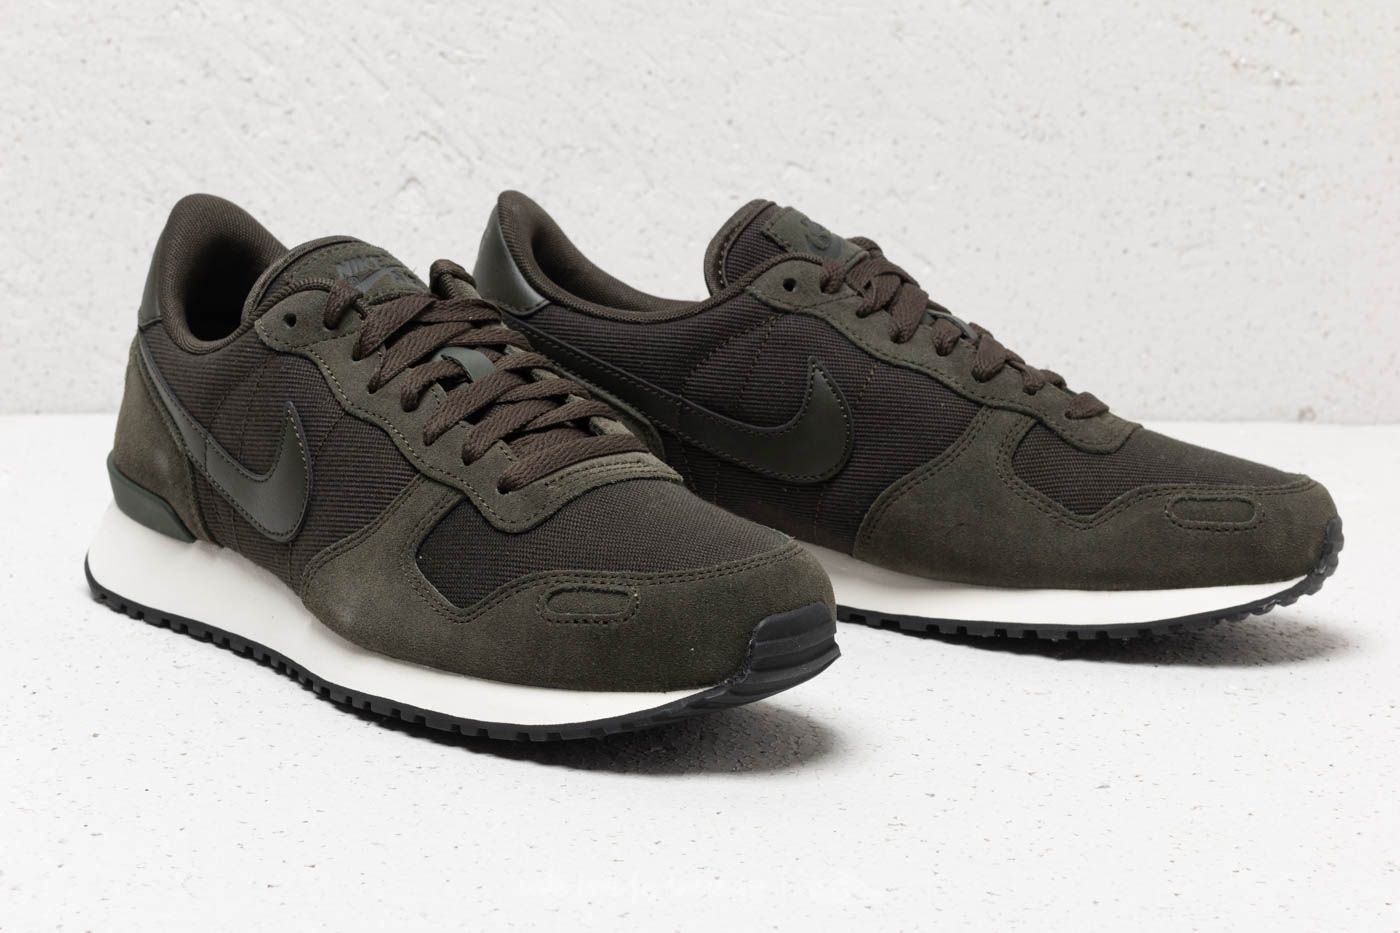 Centro tra flessibile  Men's shoes Nike Air Vortex Leather Sequoia/ Sequoia-Sail-Black   Footshop